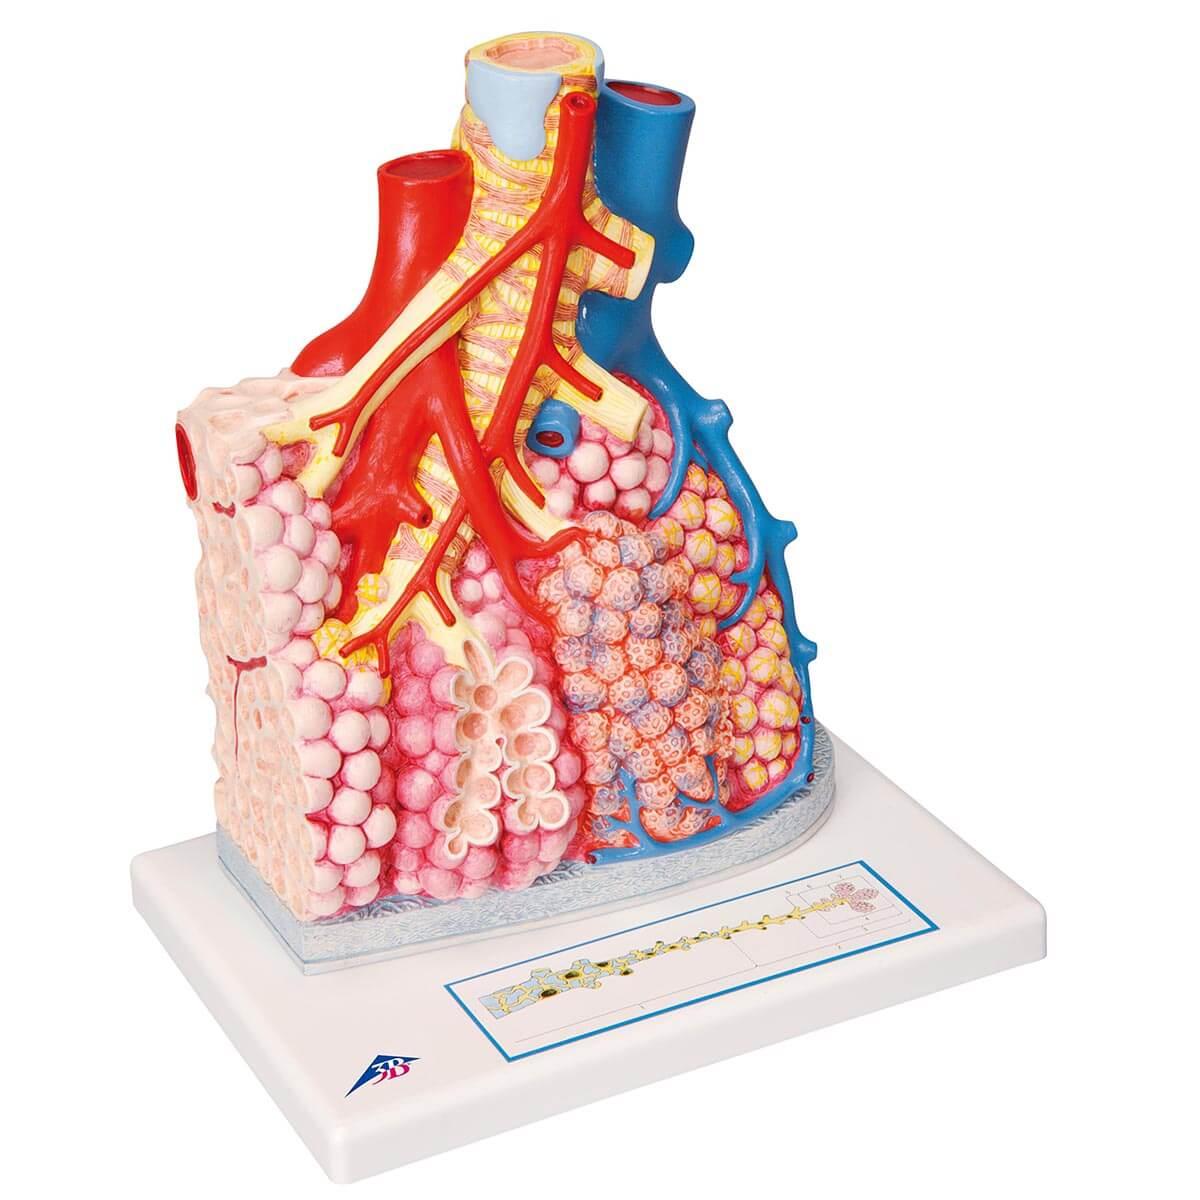 Lobos Pulmonares com Vasos Sanguíneos Circundantes